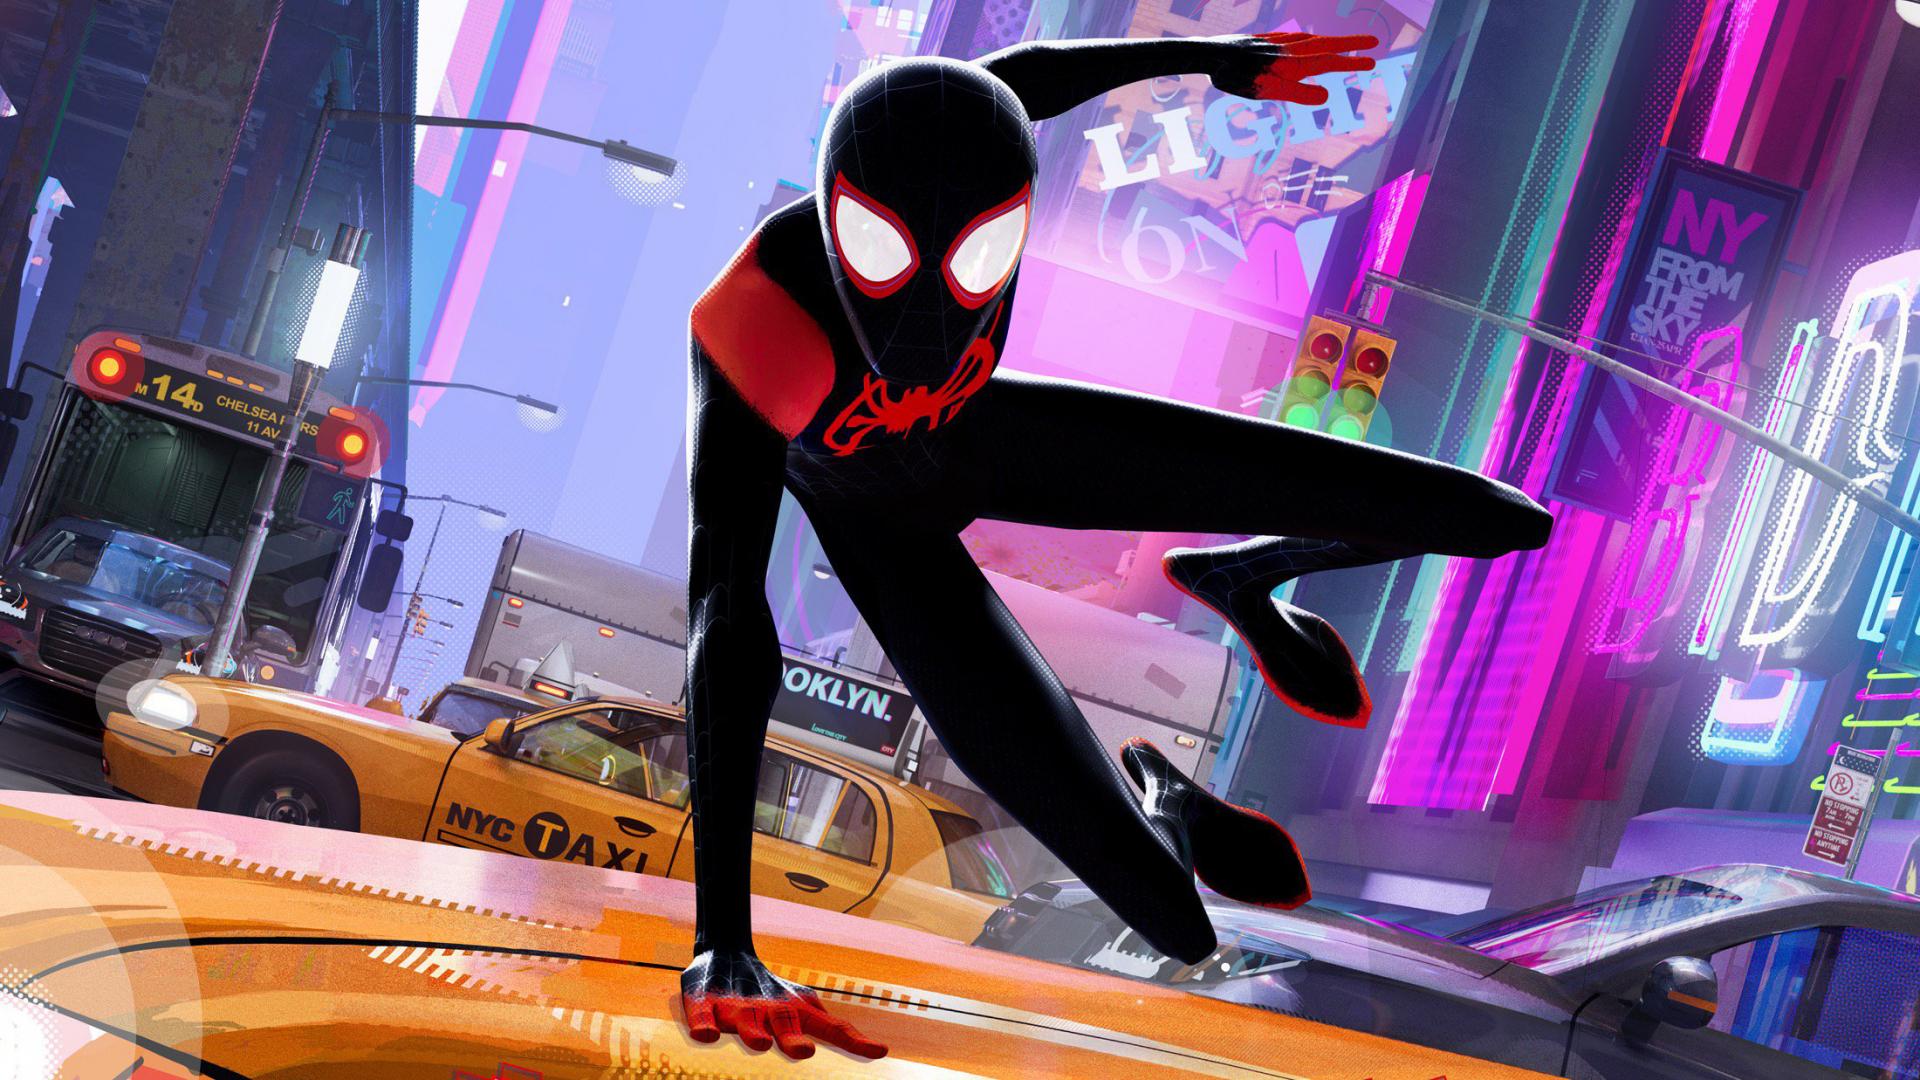 Download 1920x1080 Wallpaper Spider Man Into The Spider Verse